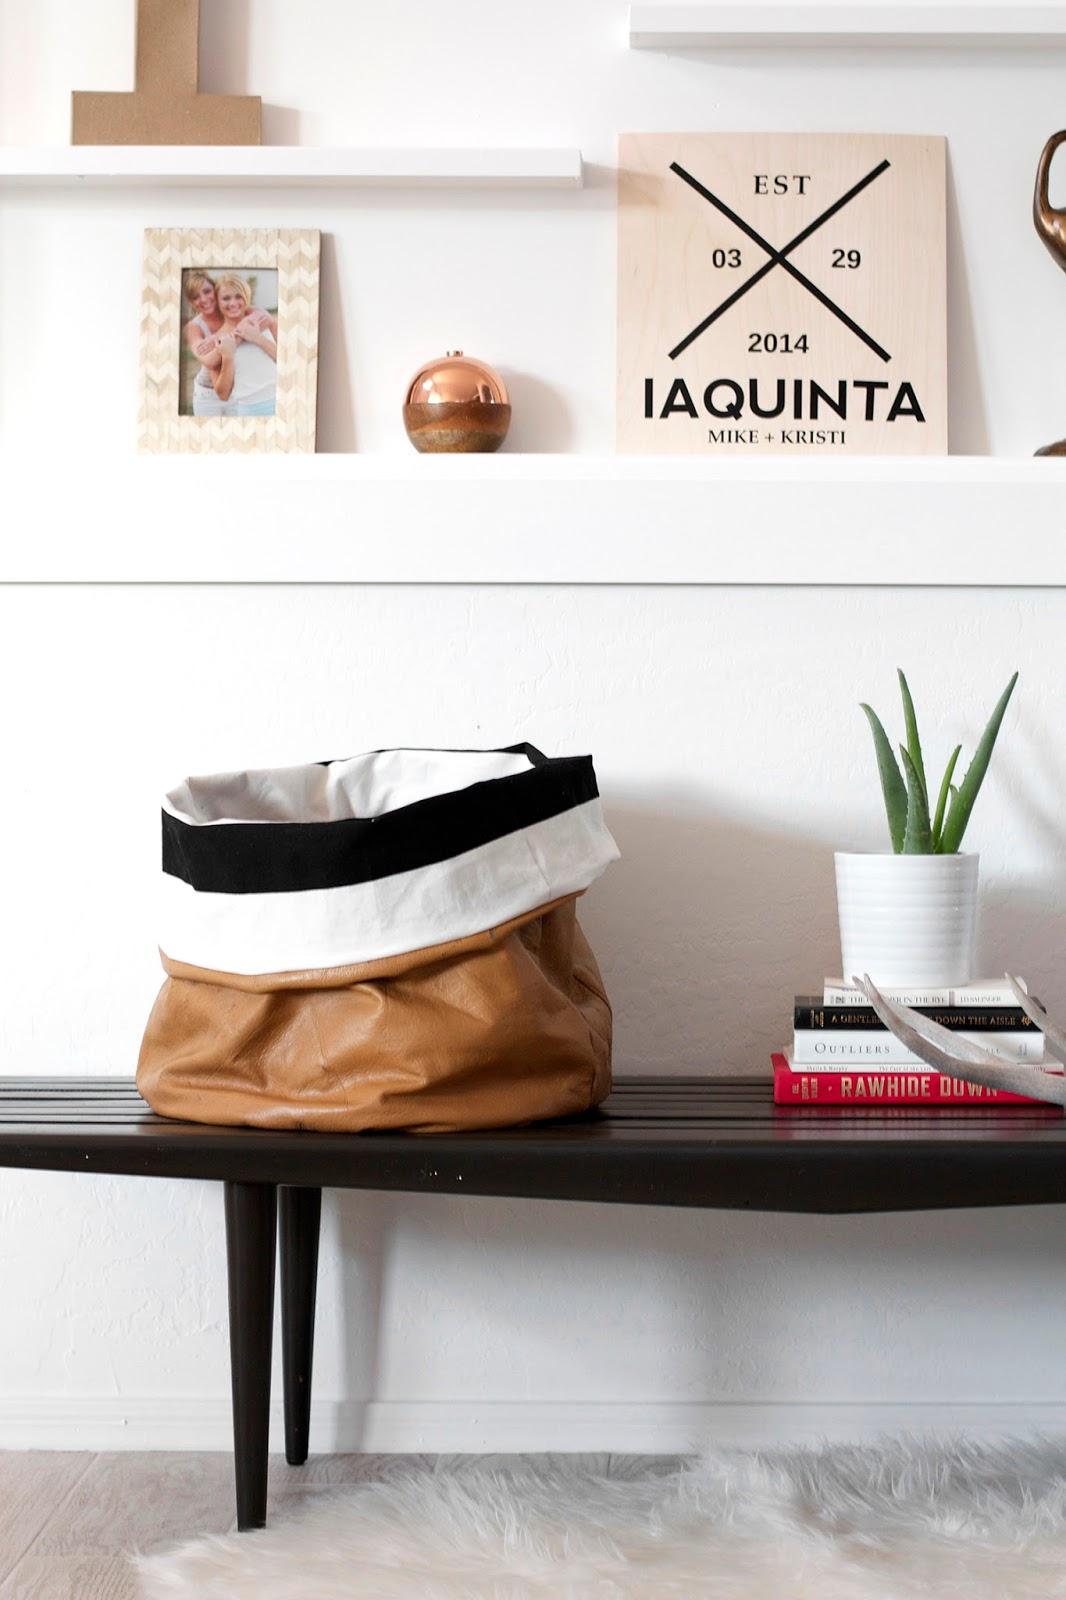 Great Organize Your Life With 25 Sweet Stylish Storage Bins